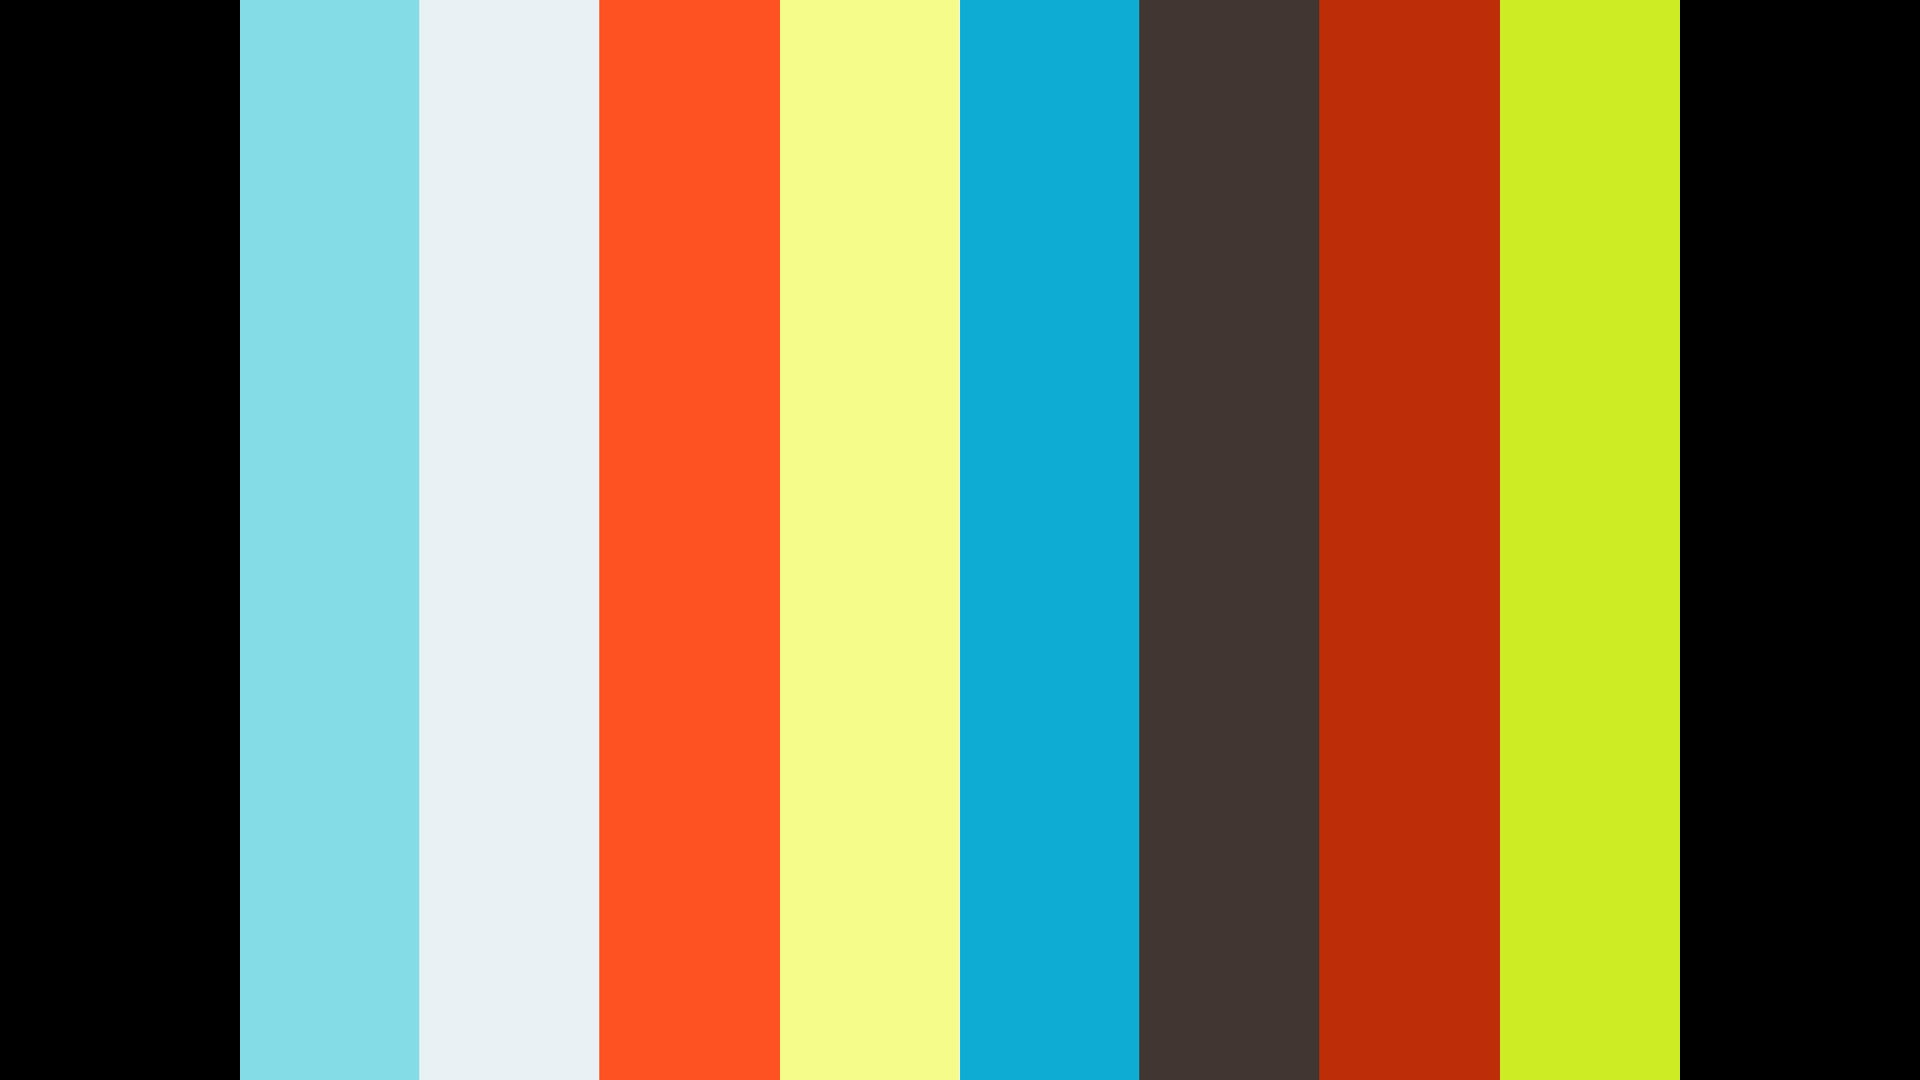 404 SPRUCE RIDGE - UB